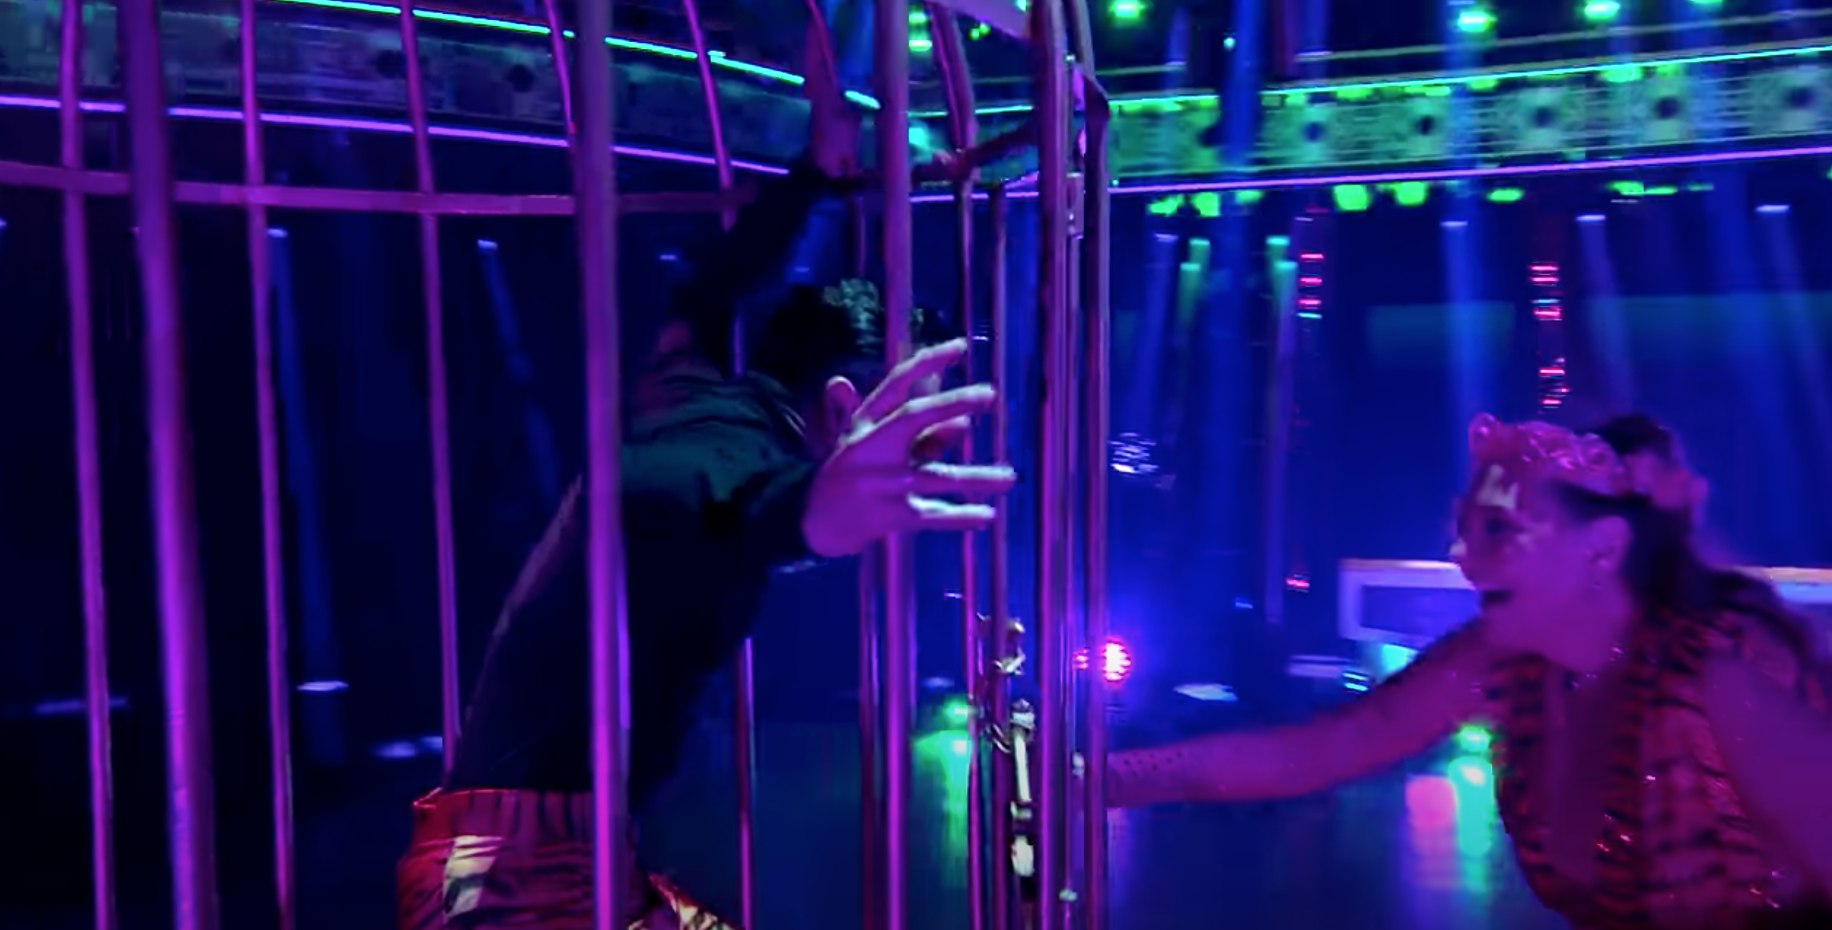 Carole Baskin and Pasha Pashkov exiting large cage at beginning of dance